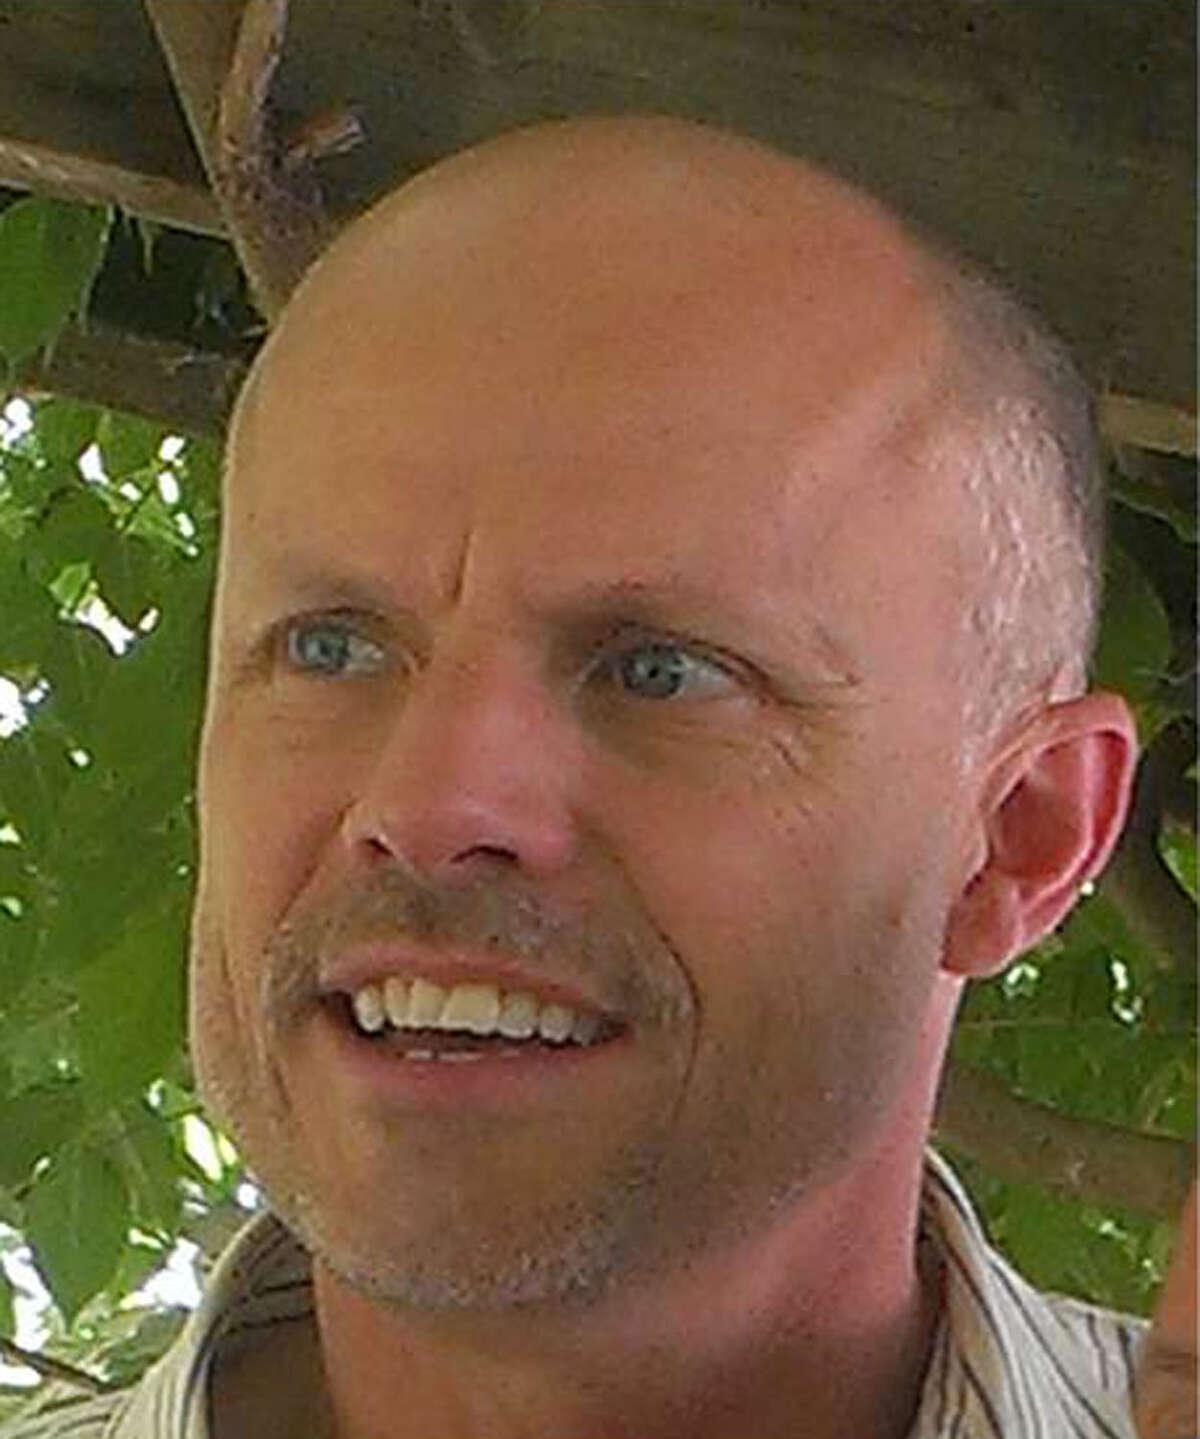 Robert Hoagland, 50, of Newtown, Conn., has been missing since July 29, 2013